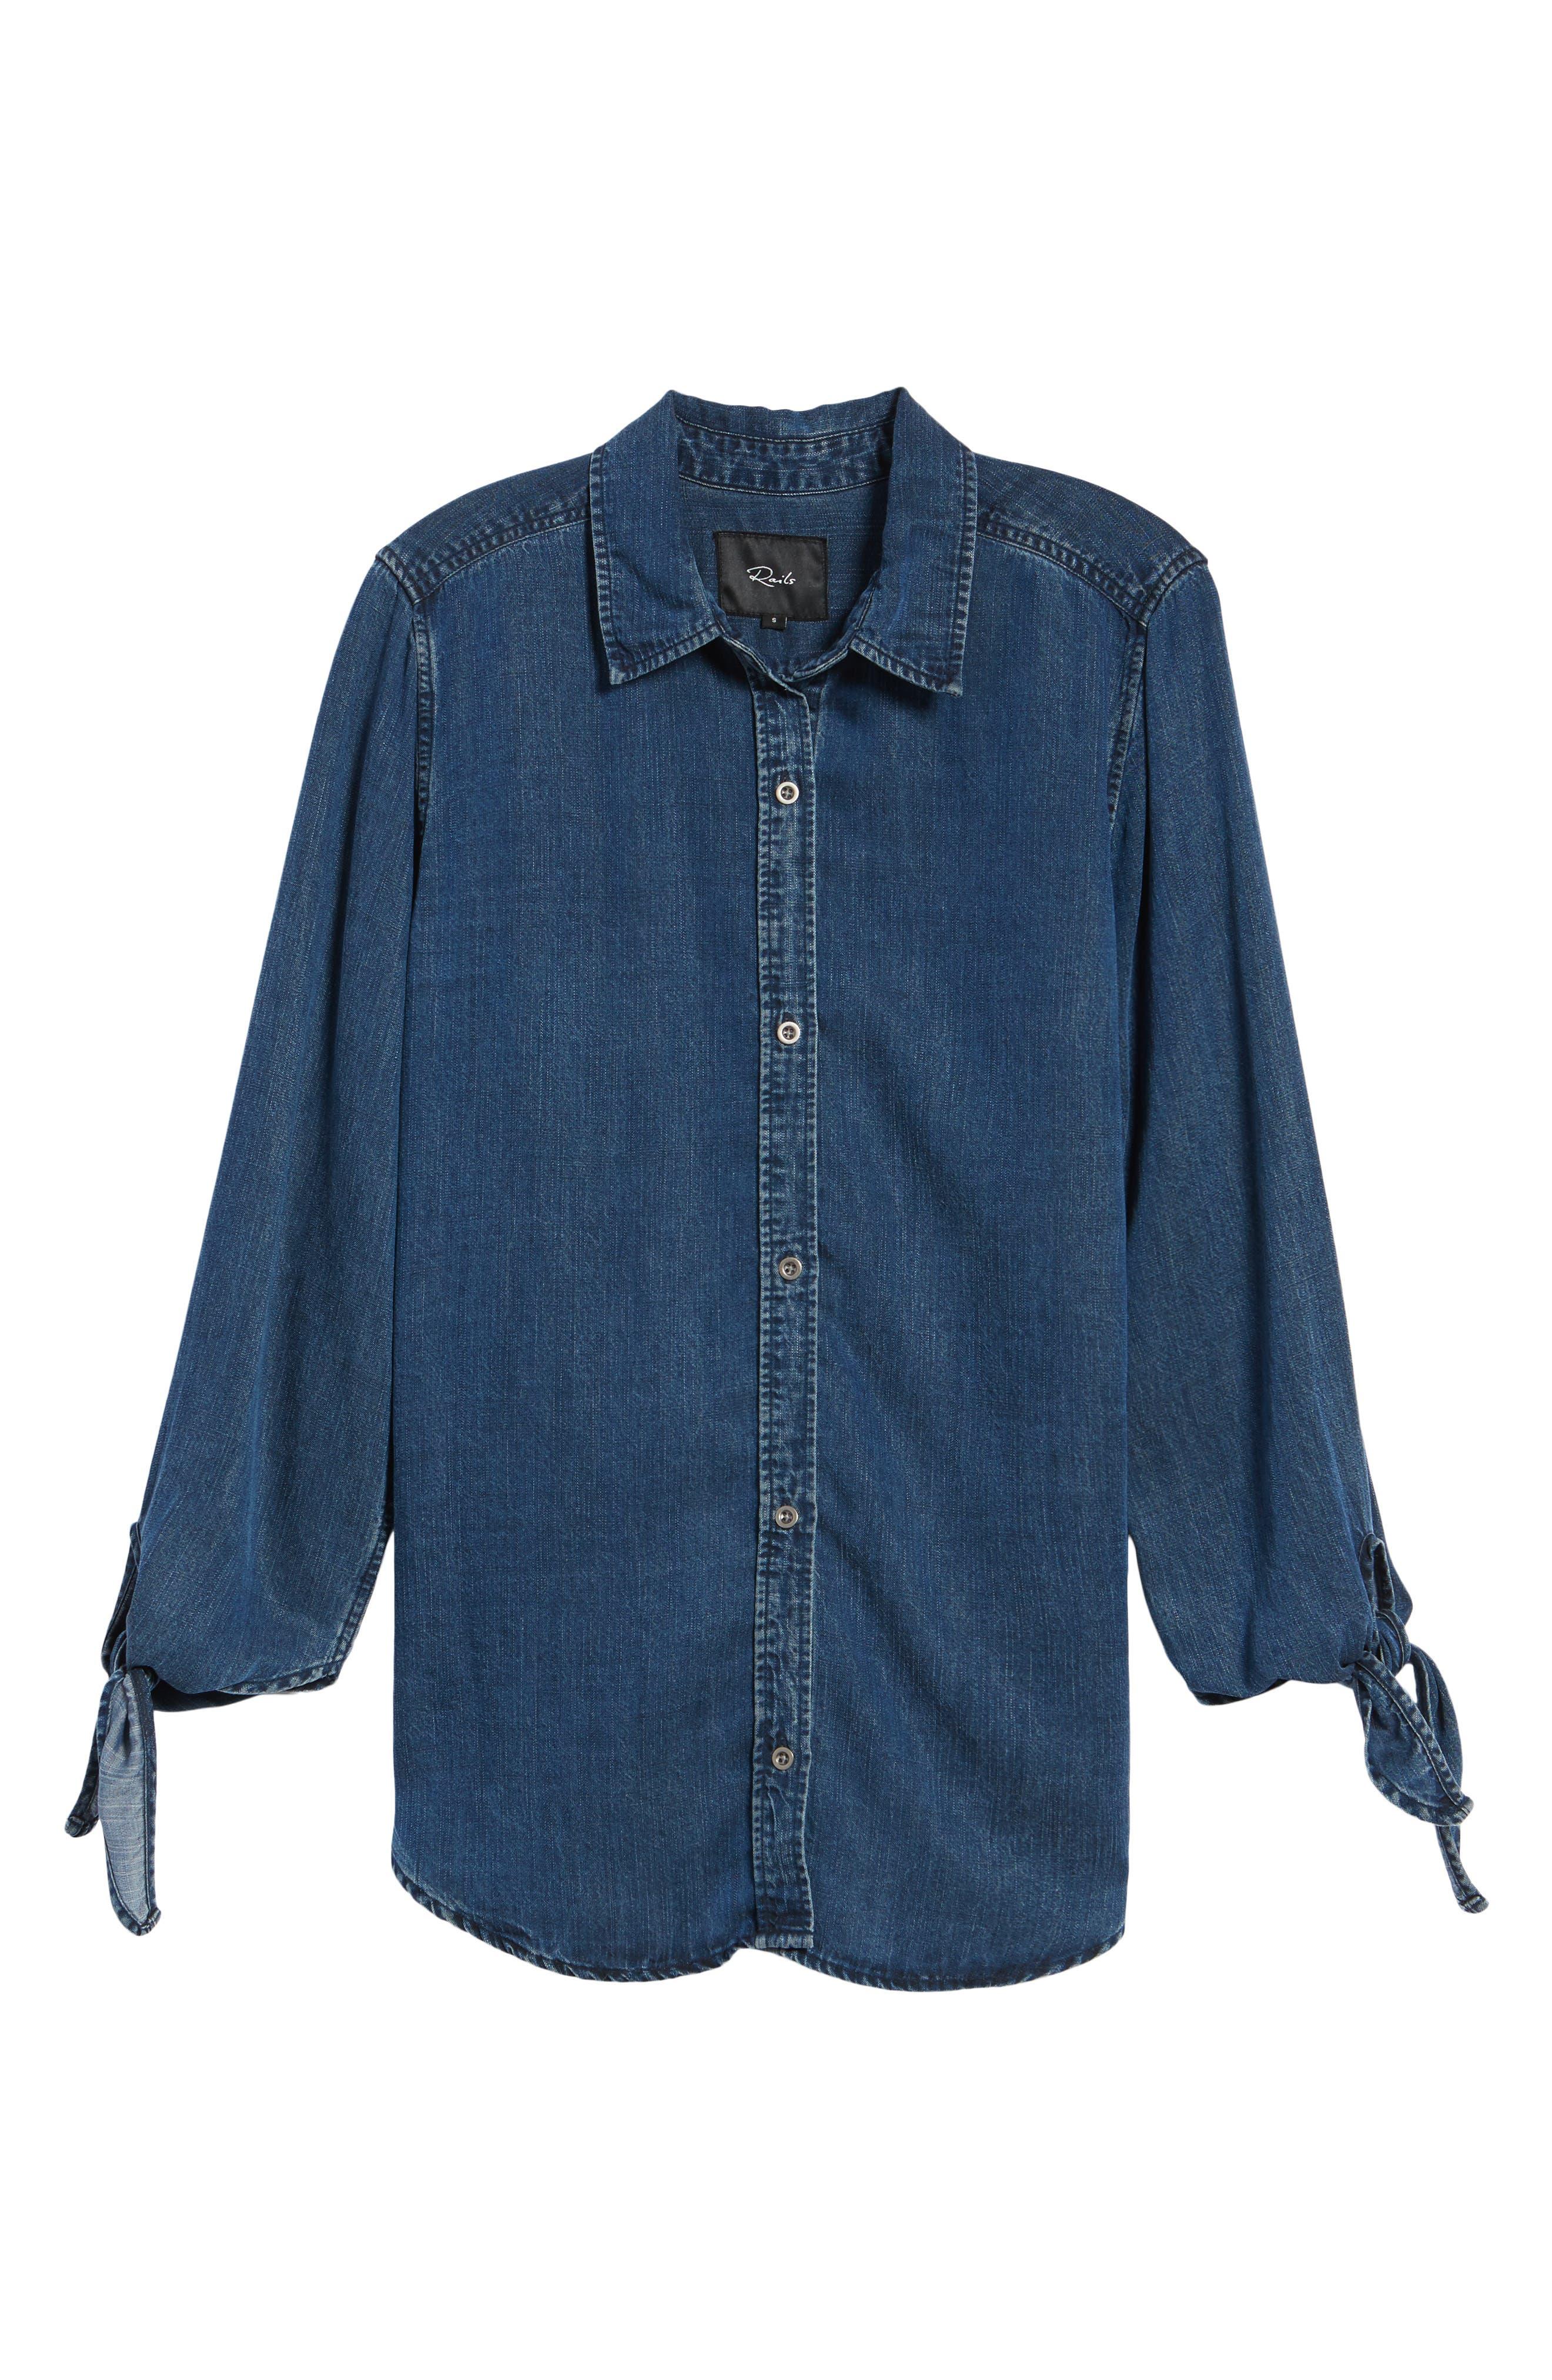 Bethany Tie Cuff Denim Shirt,                             Alternate thumbnail 6, color,                             409